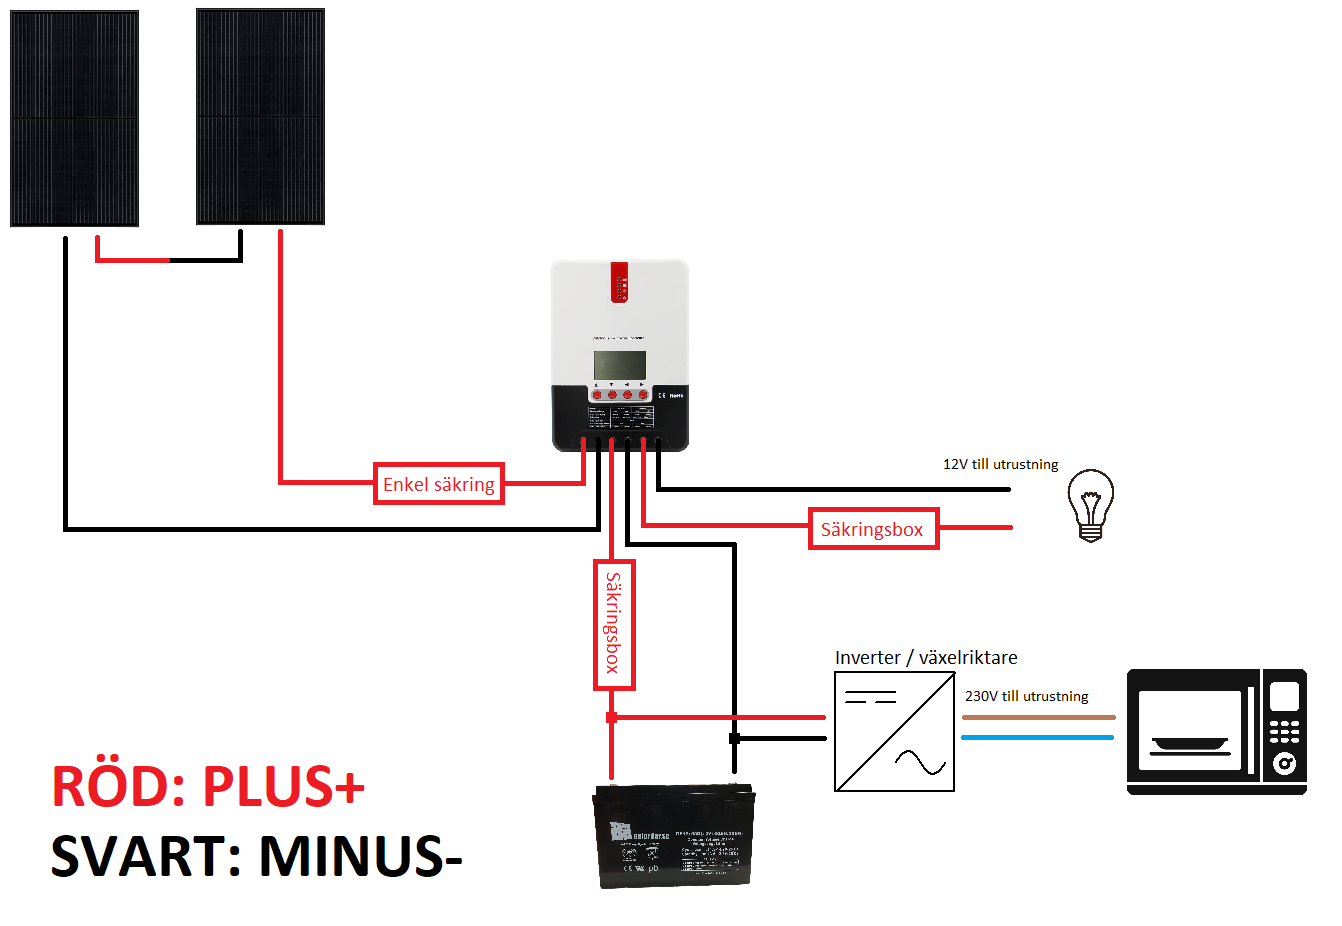 230V paket seriesolpanel singelbatteri